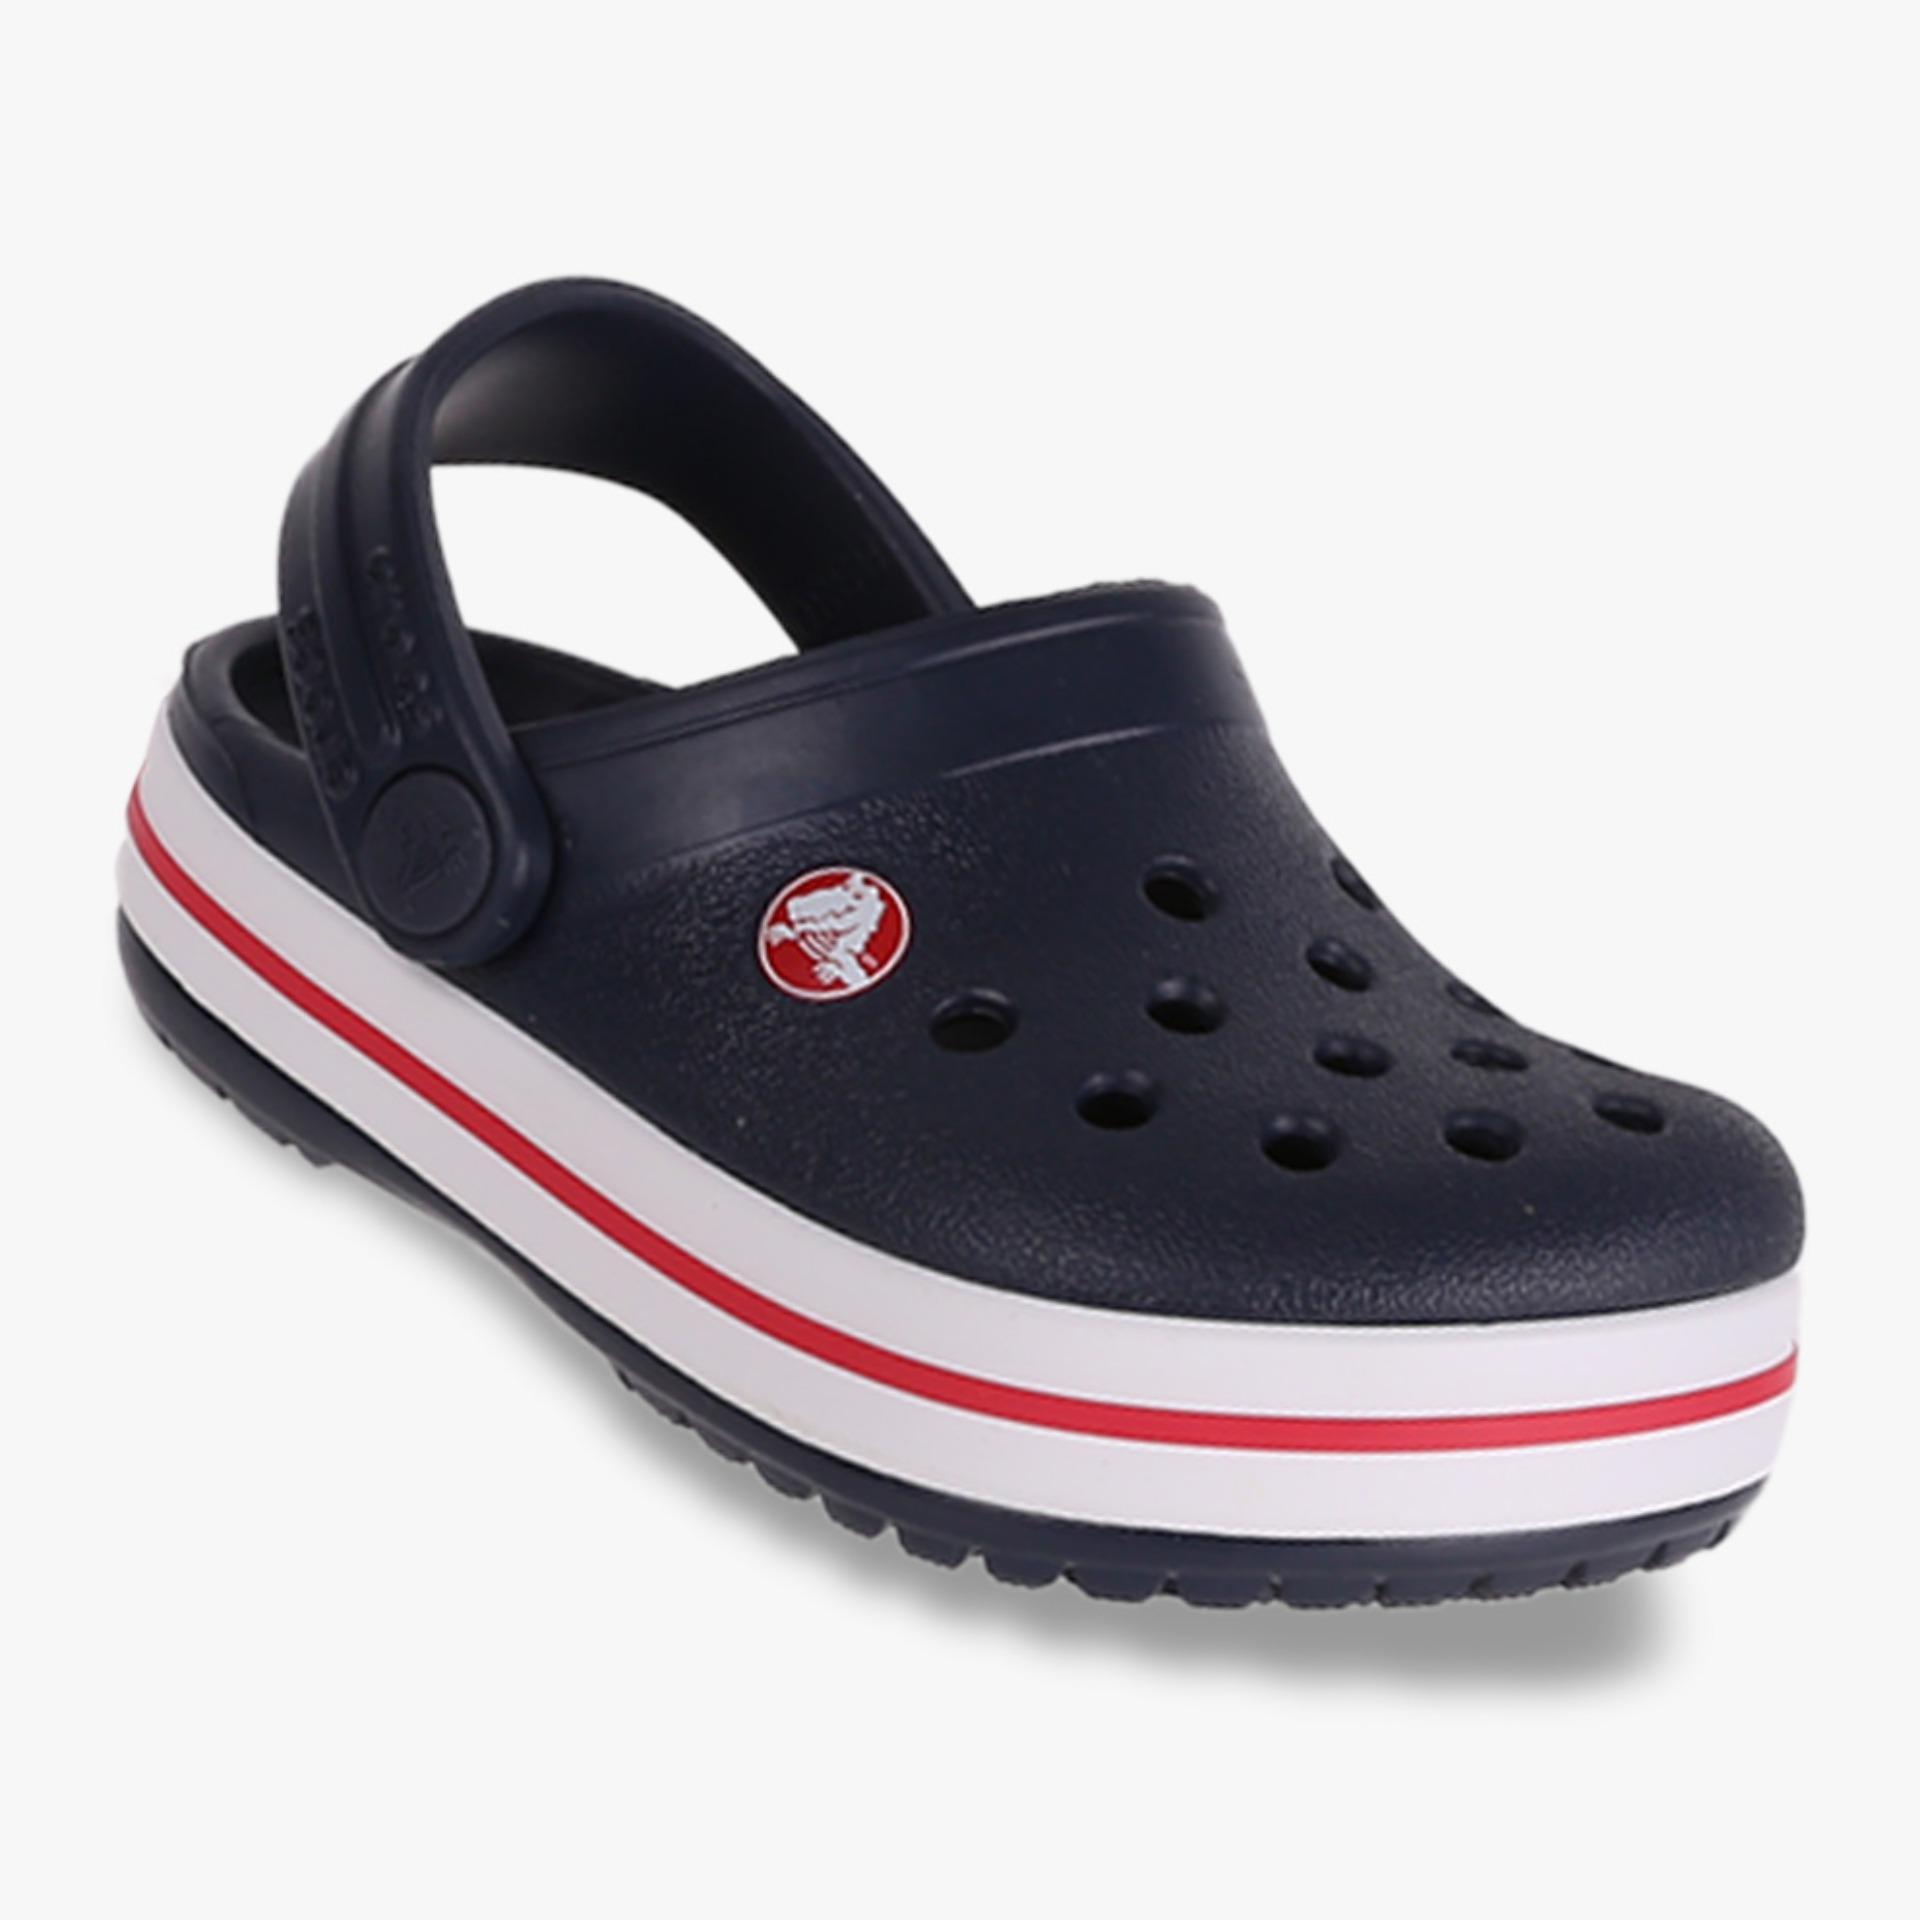 Crocs Crocband Clog Kid's Sandals - Navy